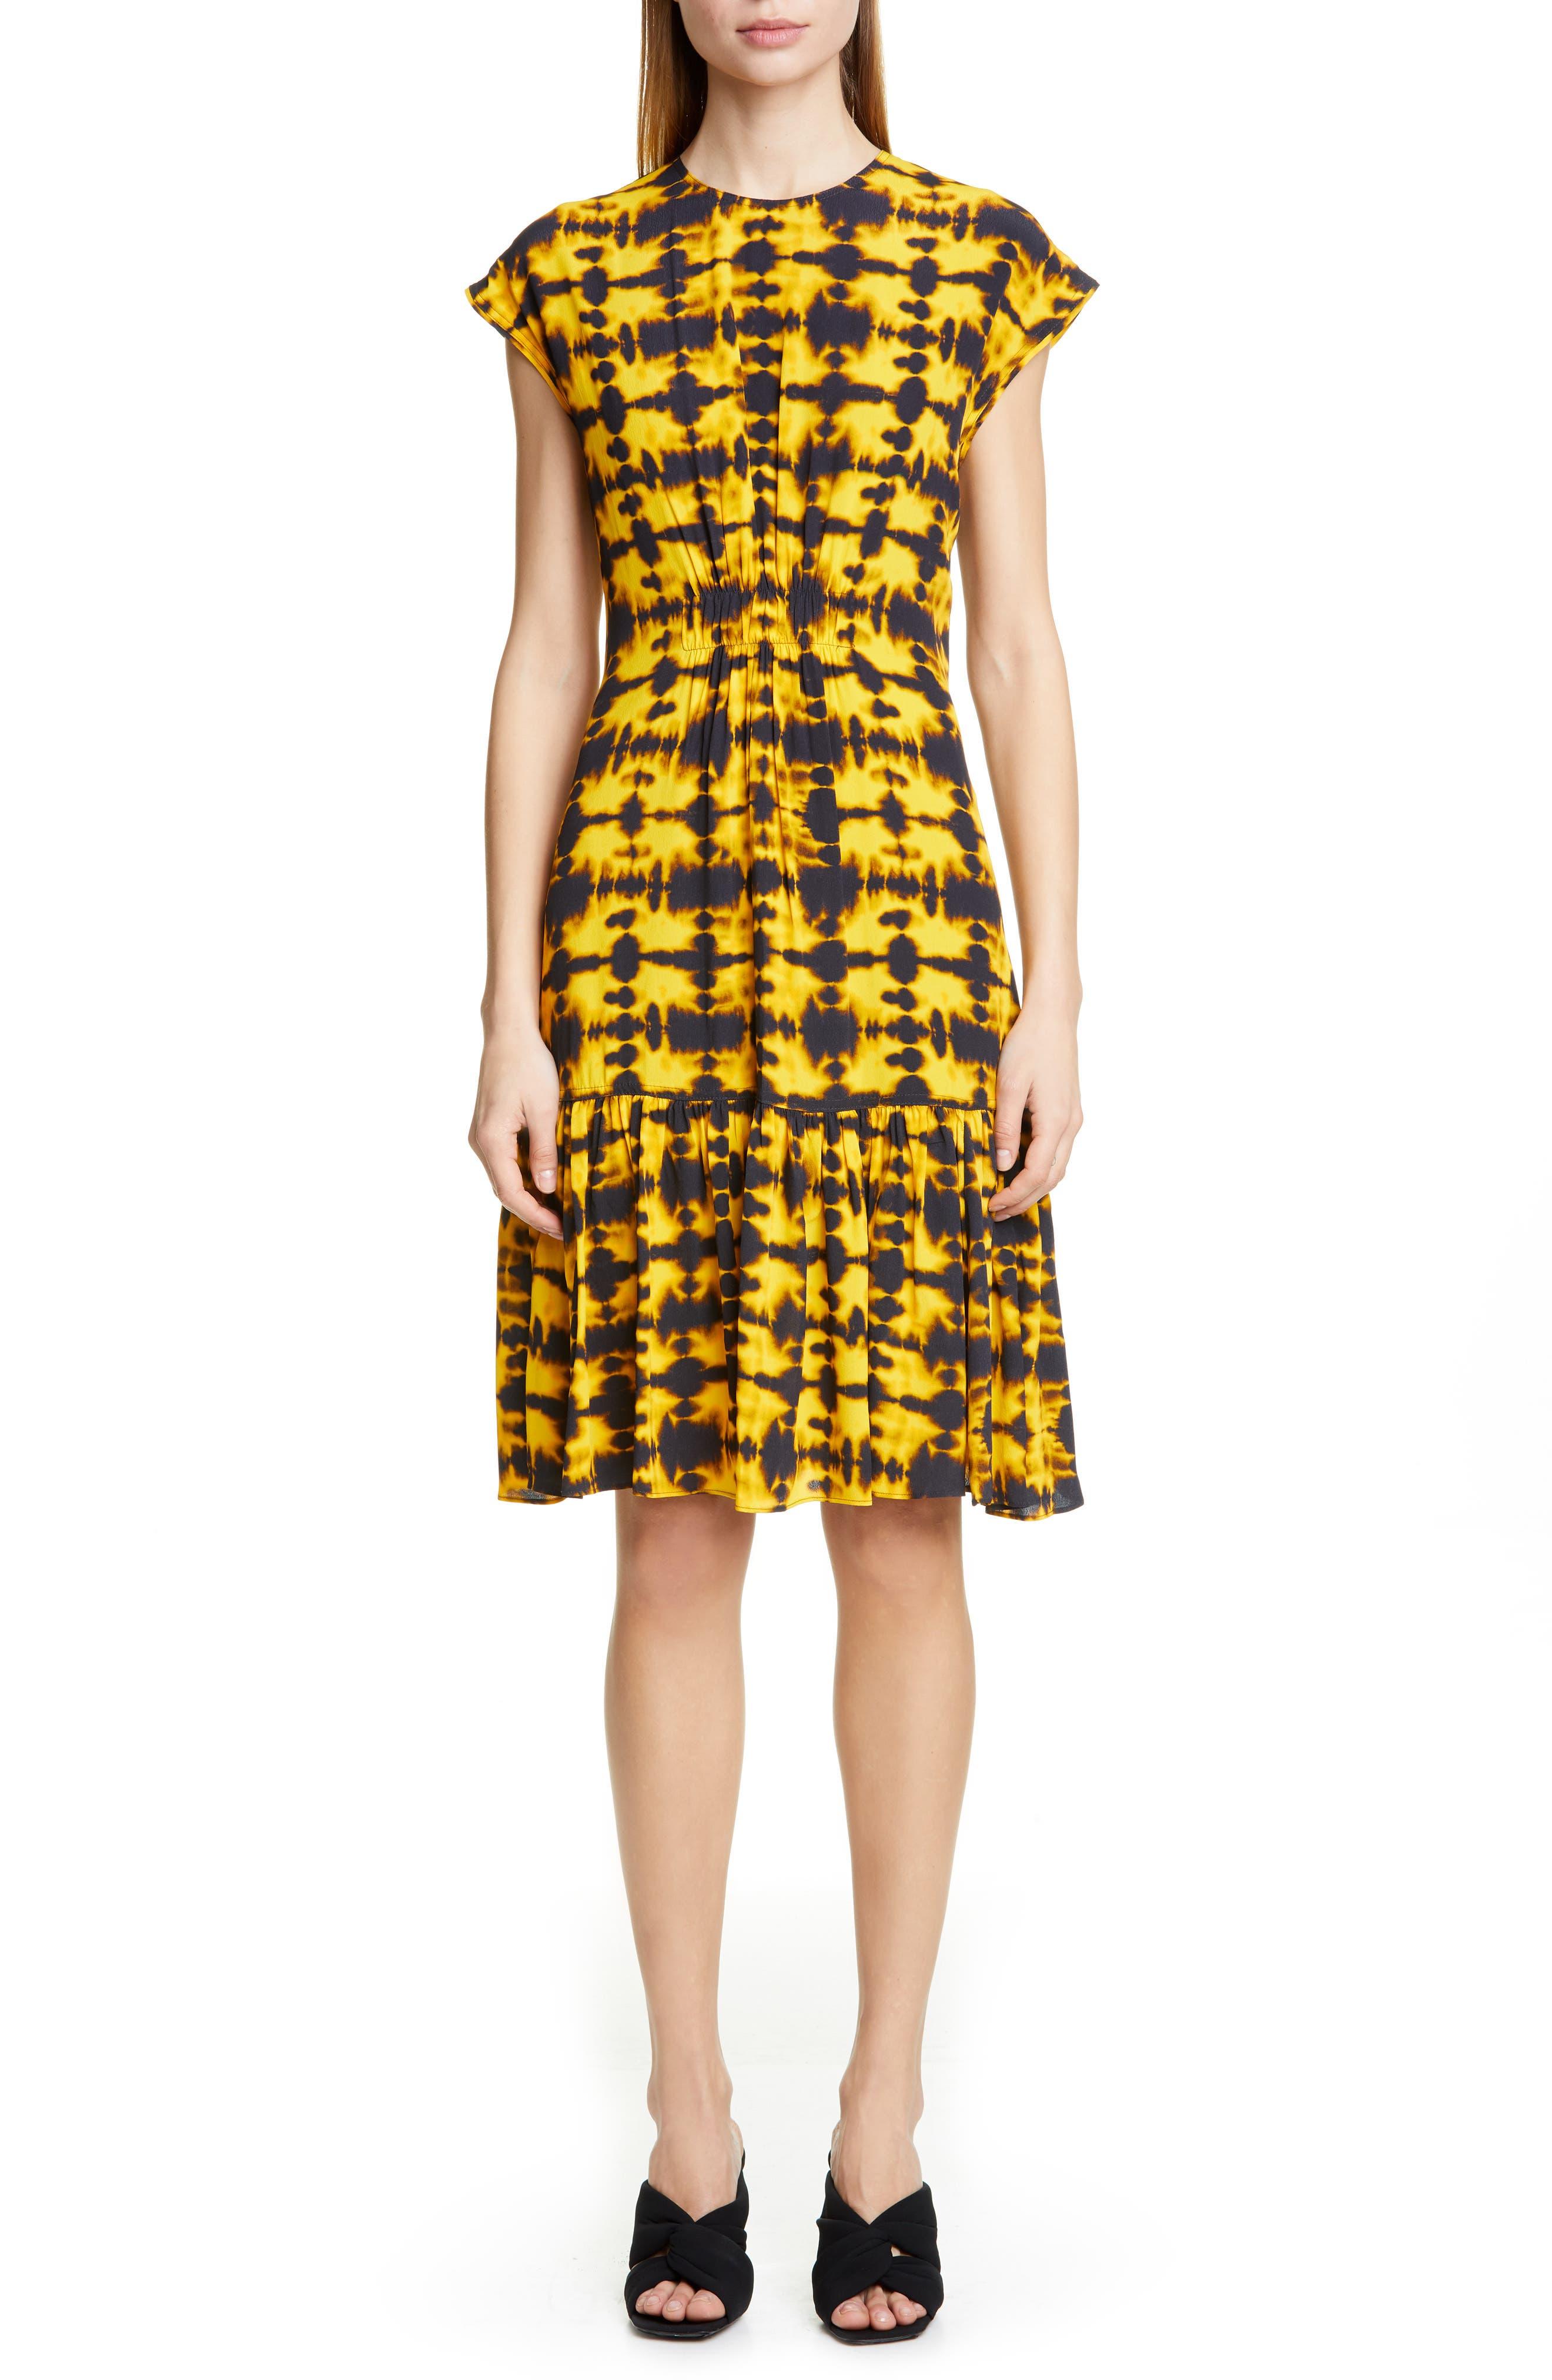 Proenza Schouler Tie Dye Dress, Yellow